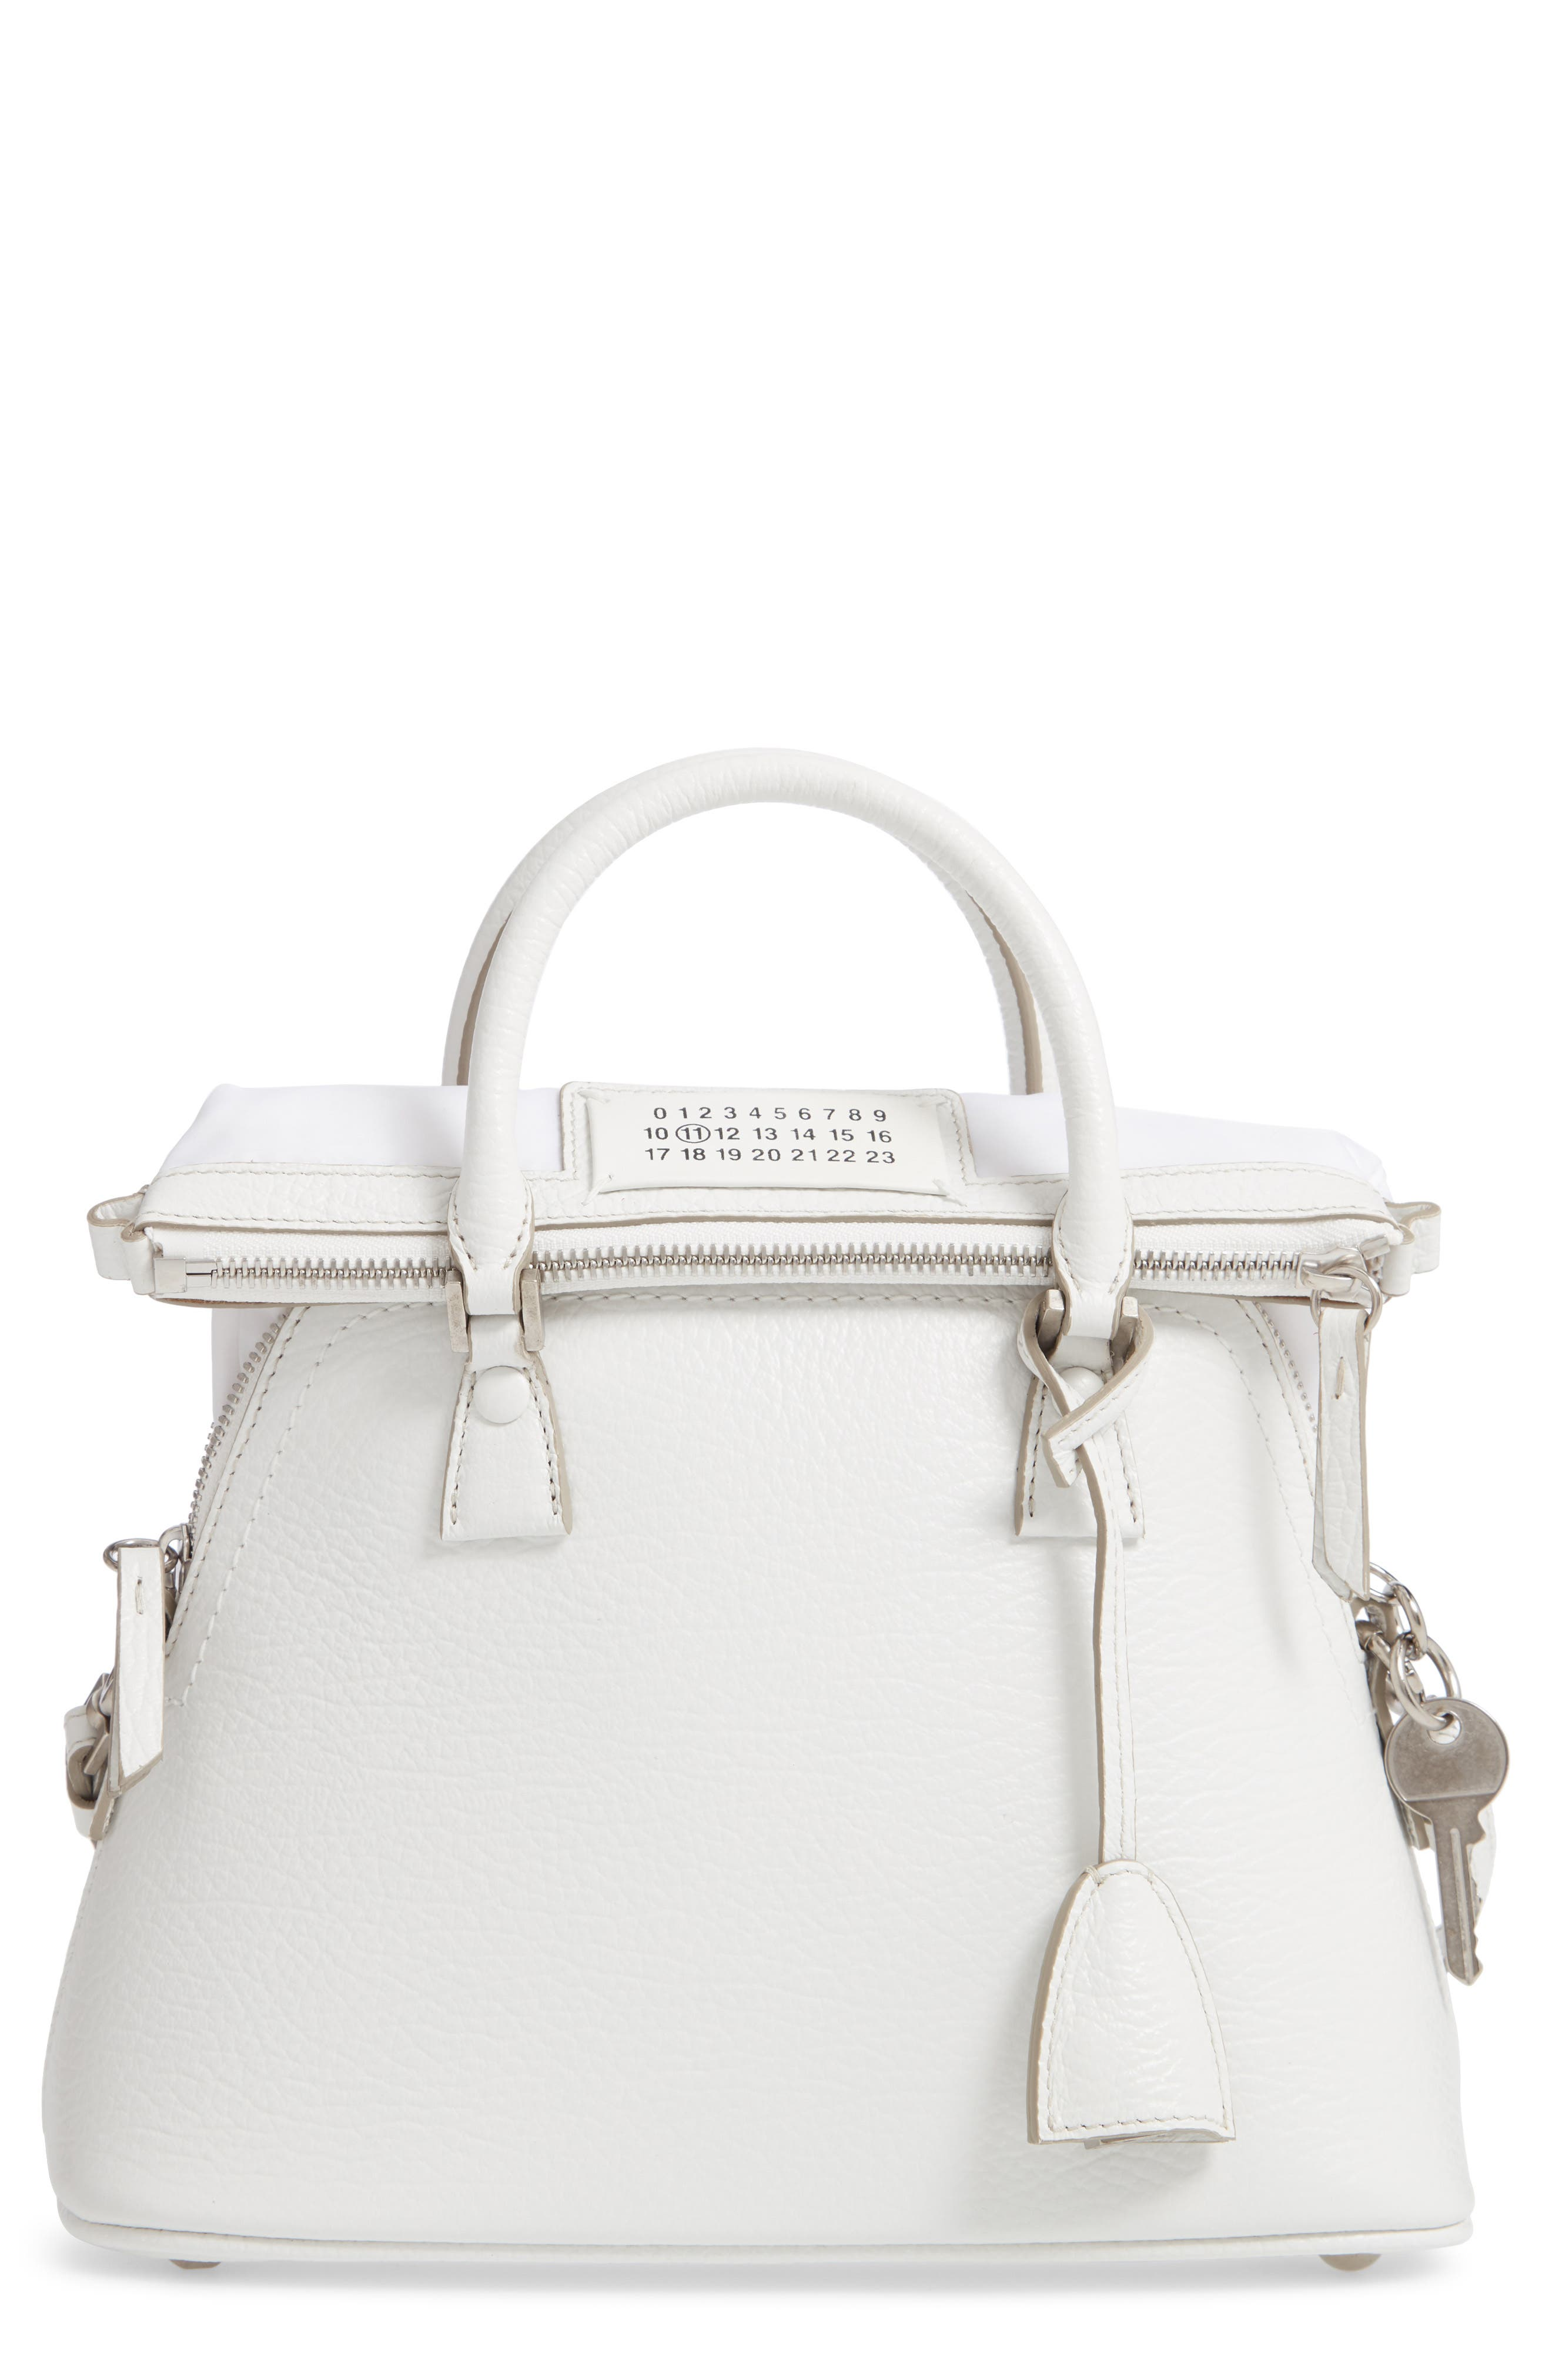 Small 5AC Calfskin Leather Handbag,                         Main,                         color, WHITE